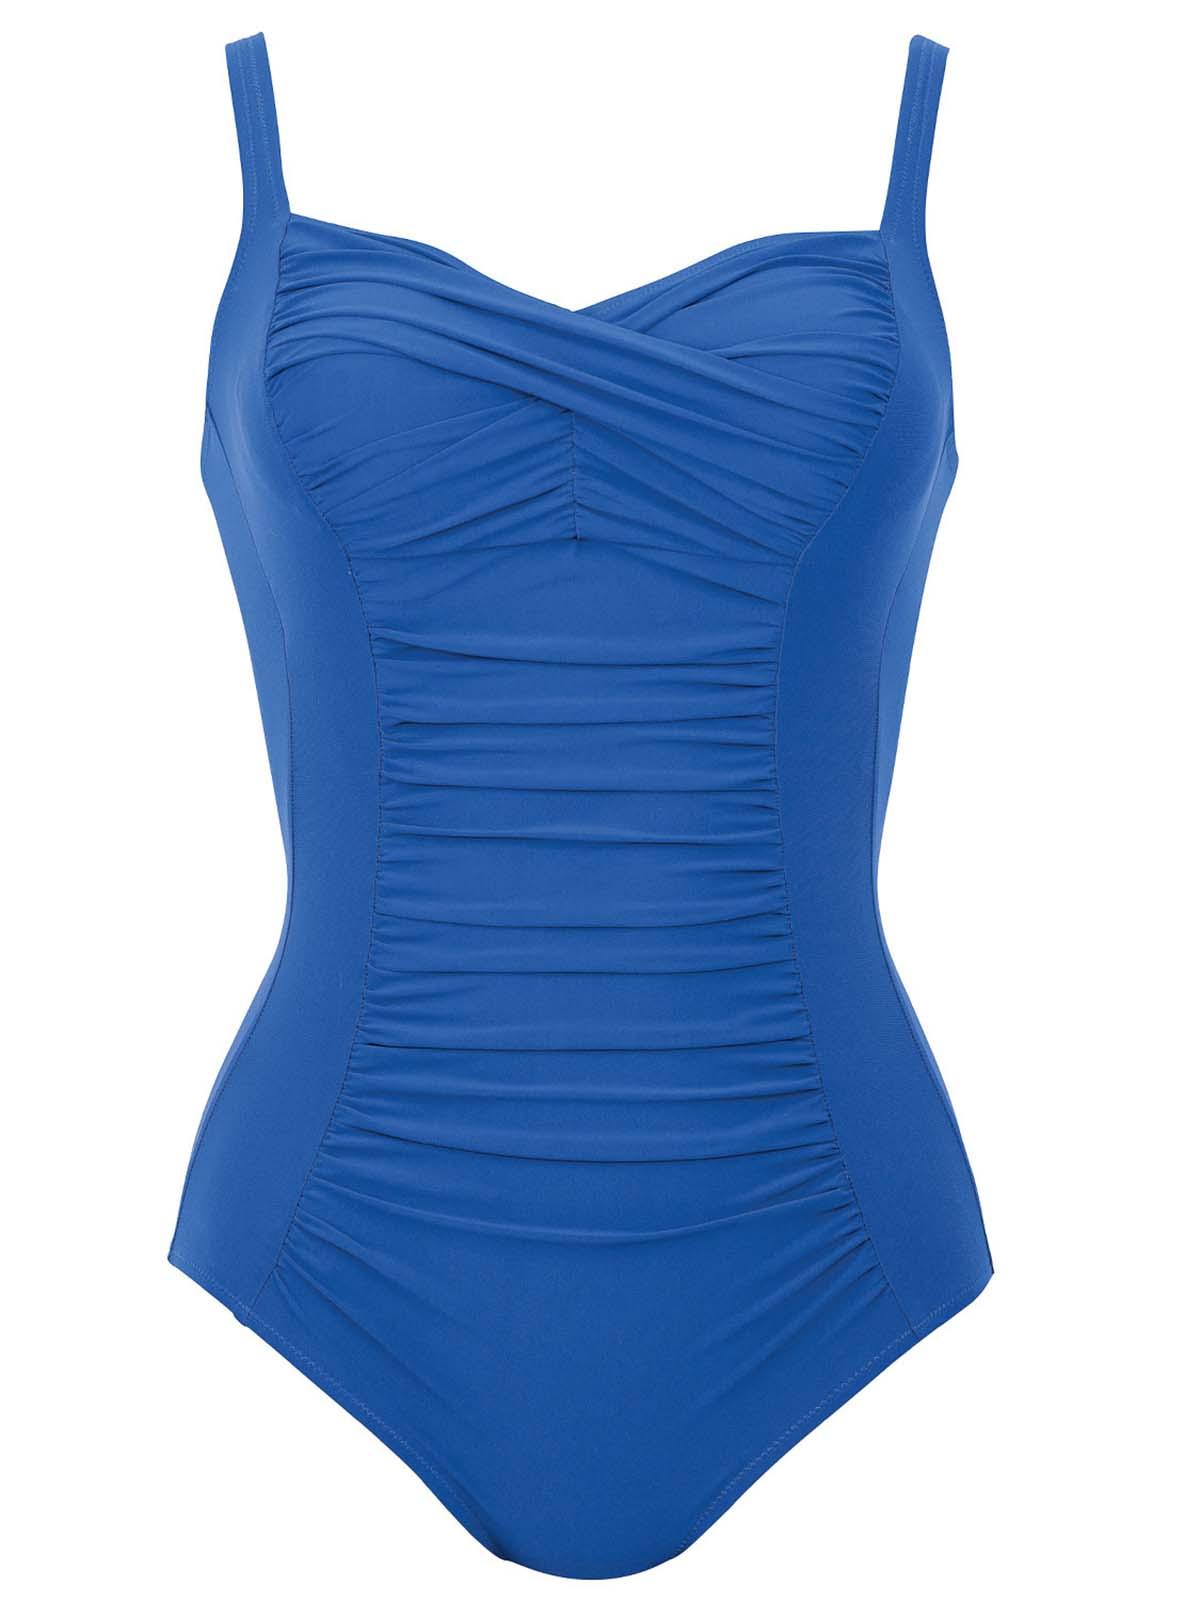 anita shaper badeanzug mit soft schale 7370 gr 38 52 b e in french blue ebay. Black Bedroom Furniture Sets. Home Design Ideas